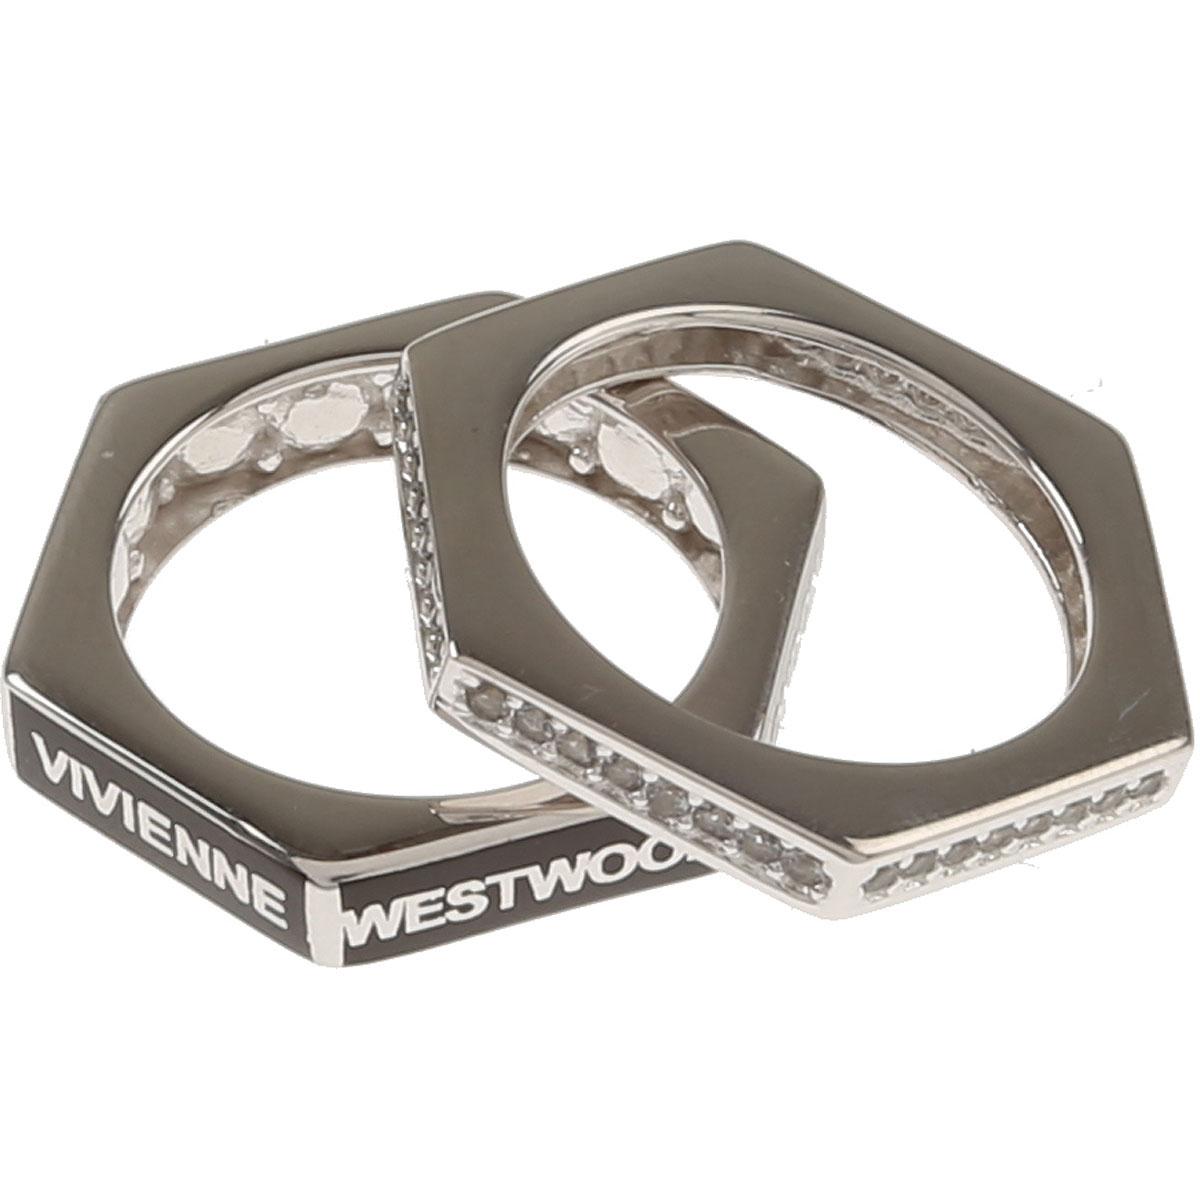 Image of Vivienne Westwood Ring for Men, Silver, Rhodium, 2017, Medium Large X-Large